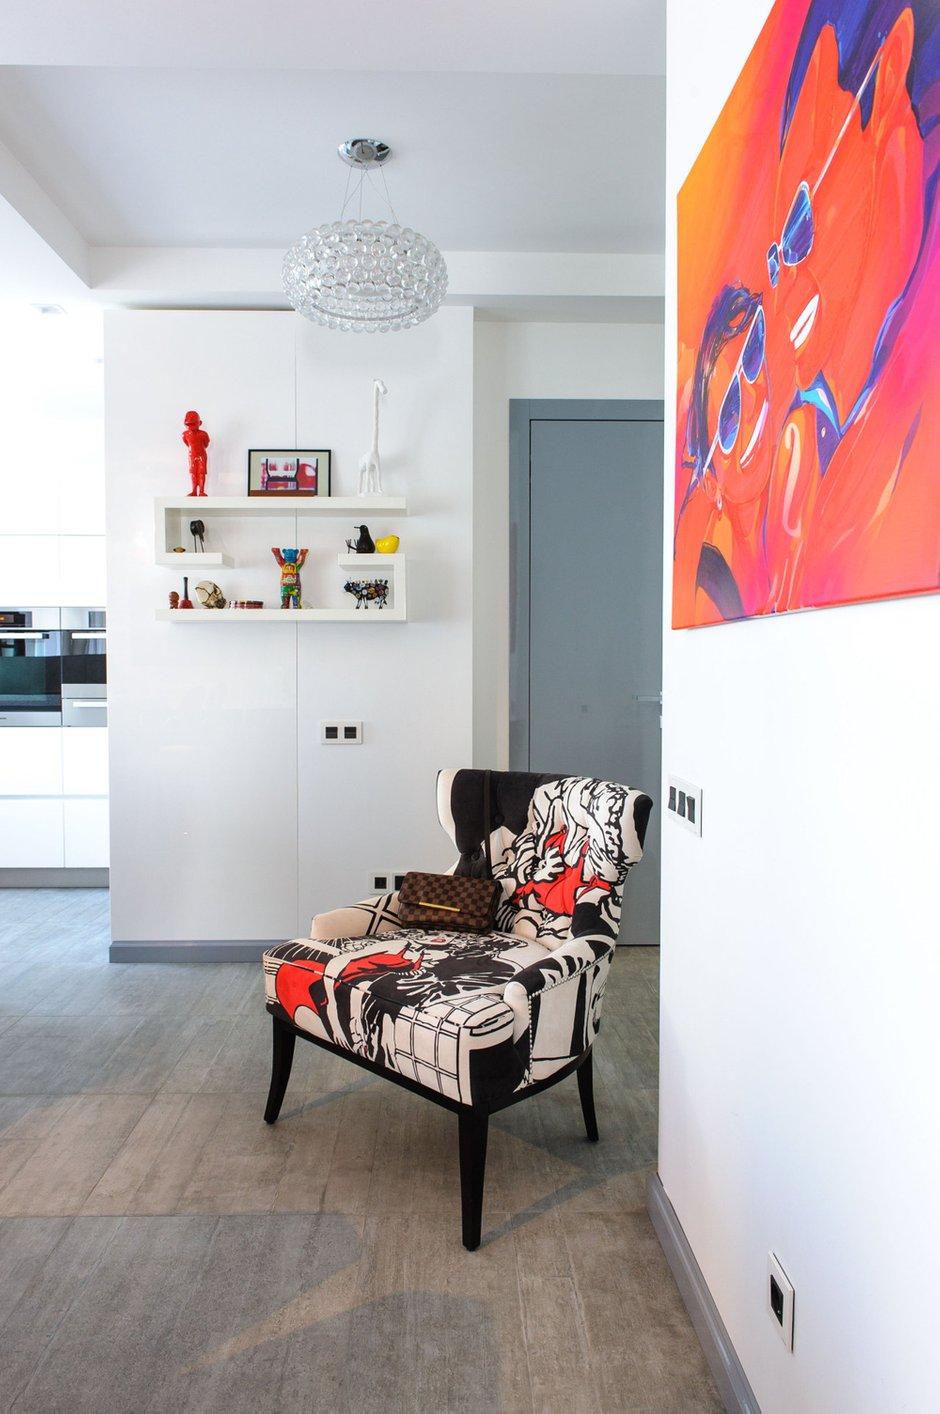 Фотография: Мебель и свет в стиле Лофт, Квартира, Дома и квартиры, Проект недели, Поп-арт – фото на INMYROOM